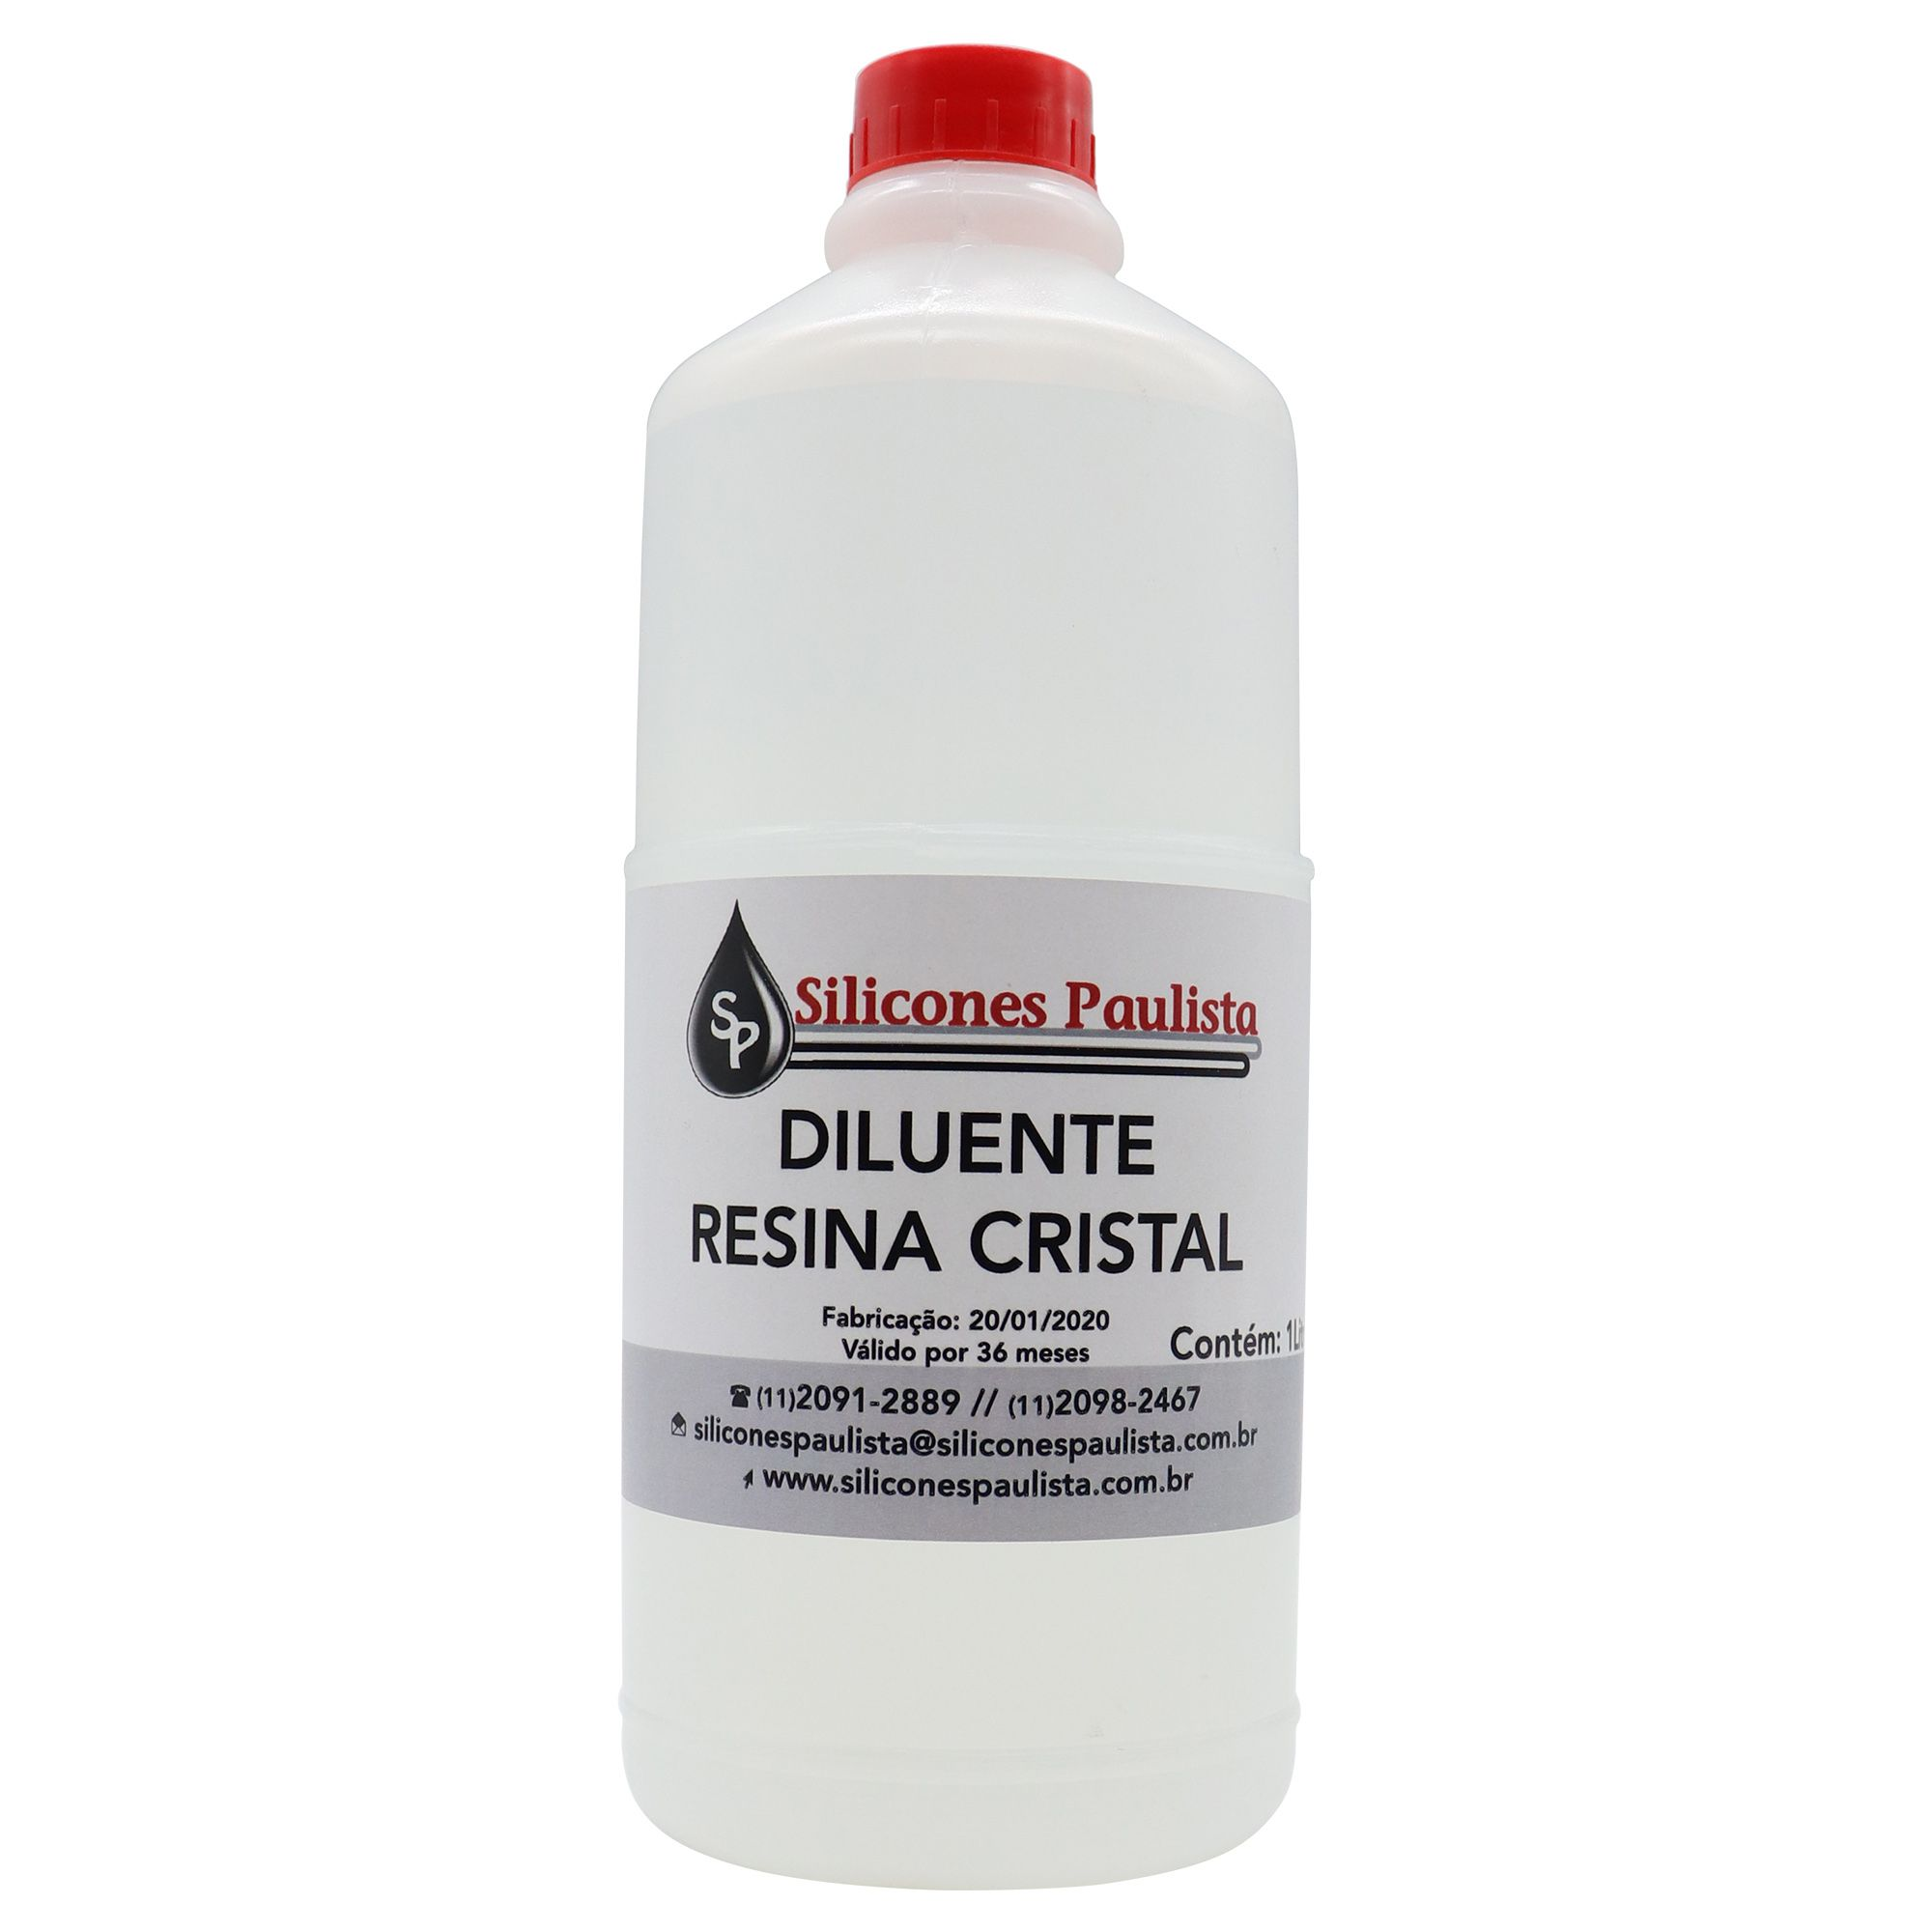 Diluente para Resina Cristal 1L